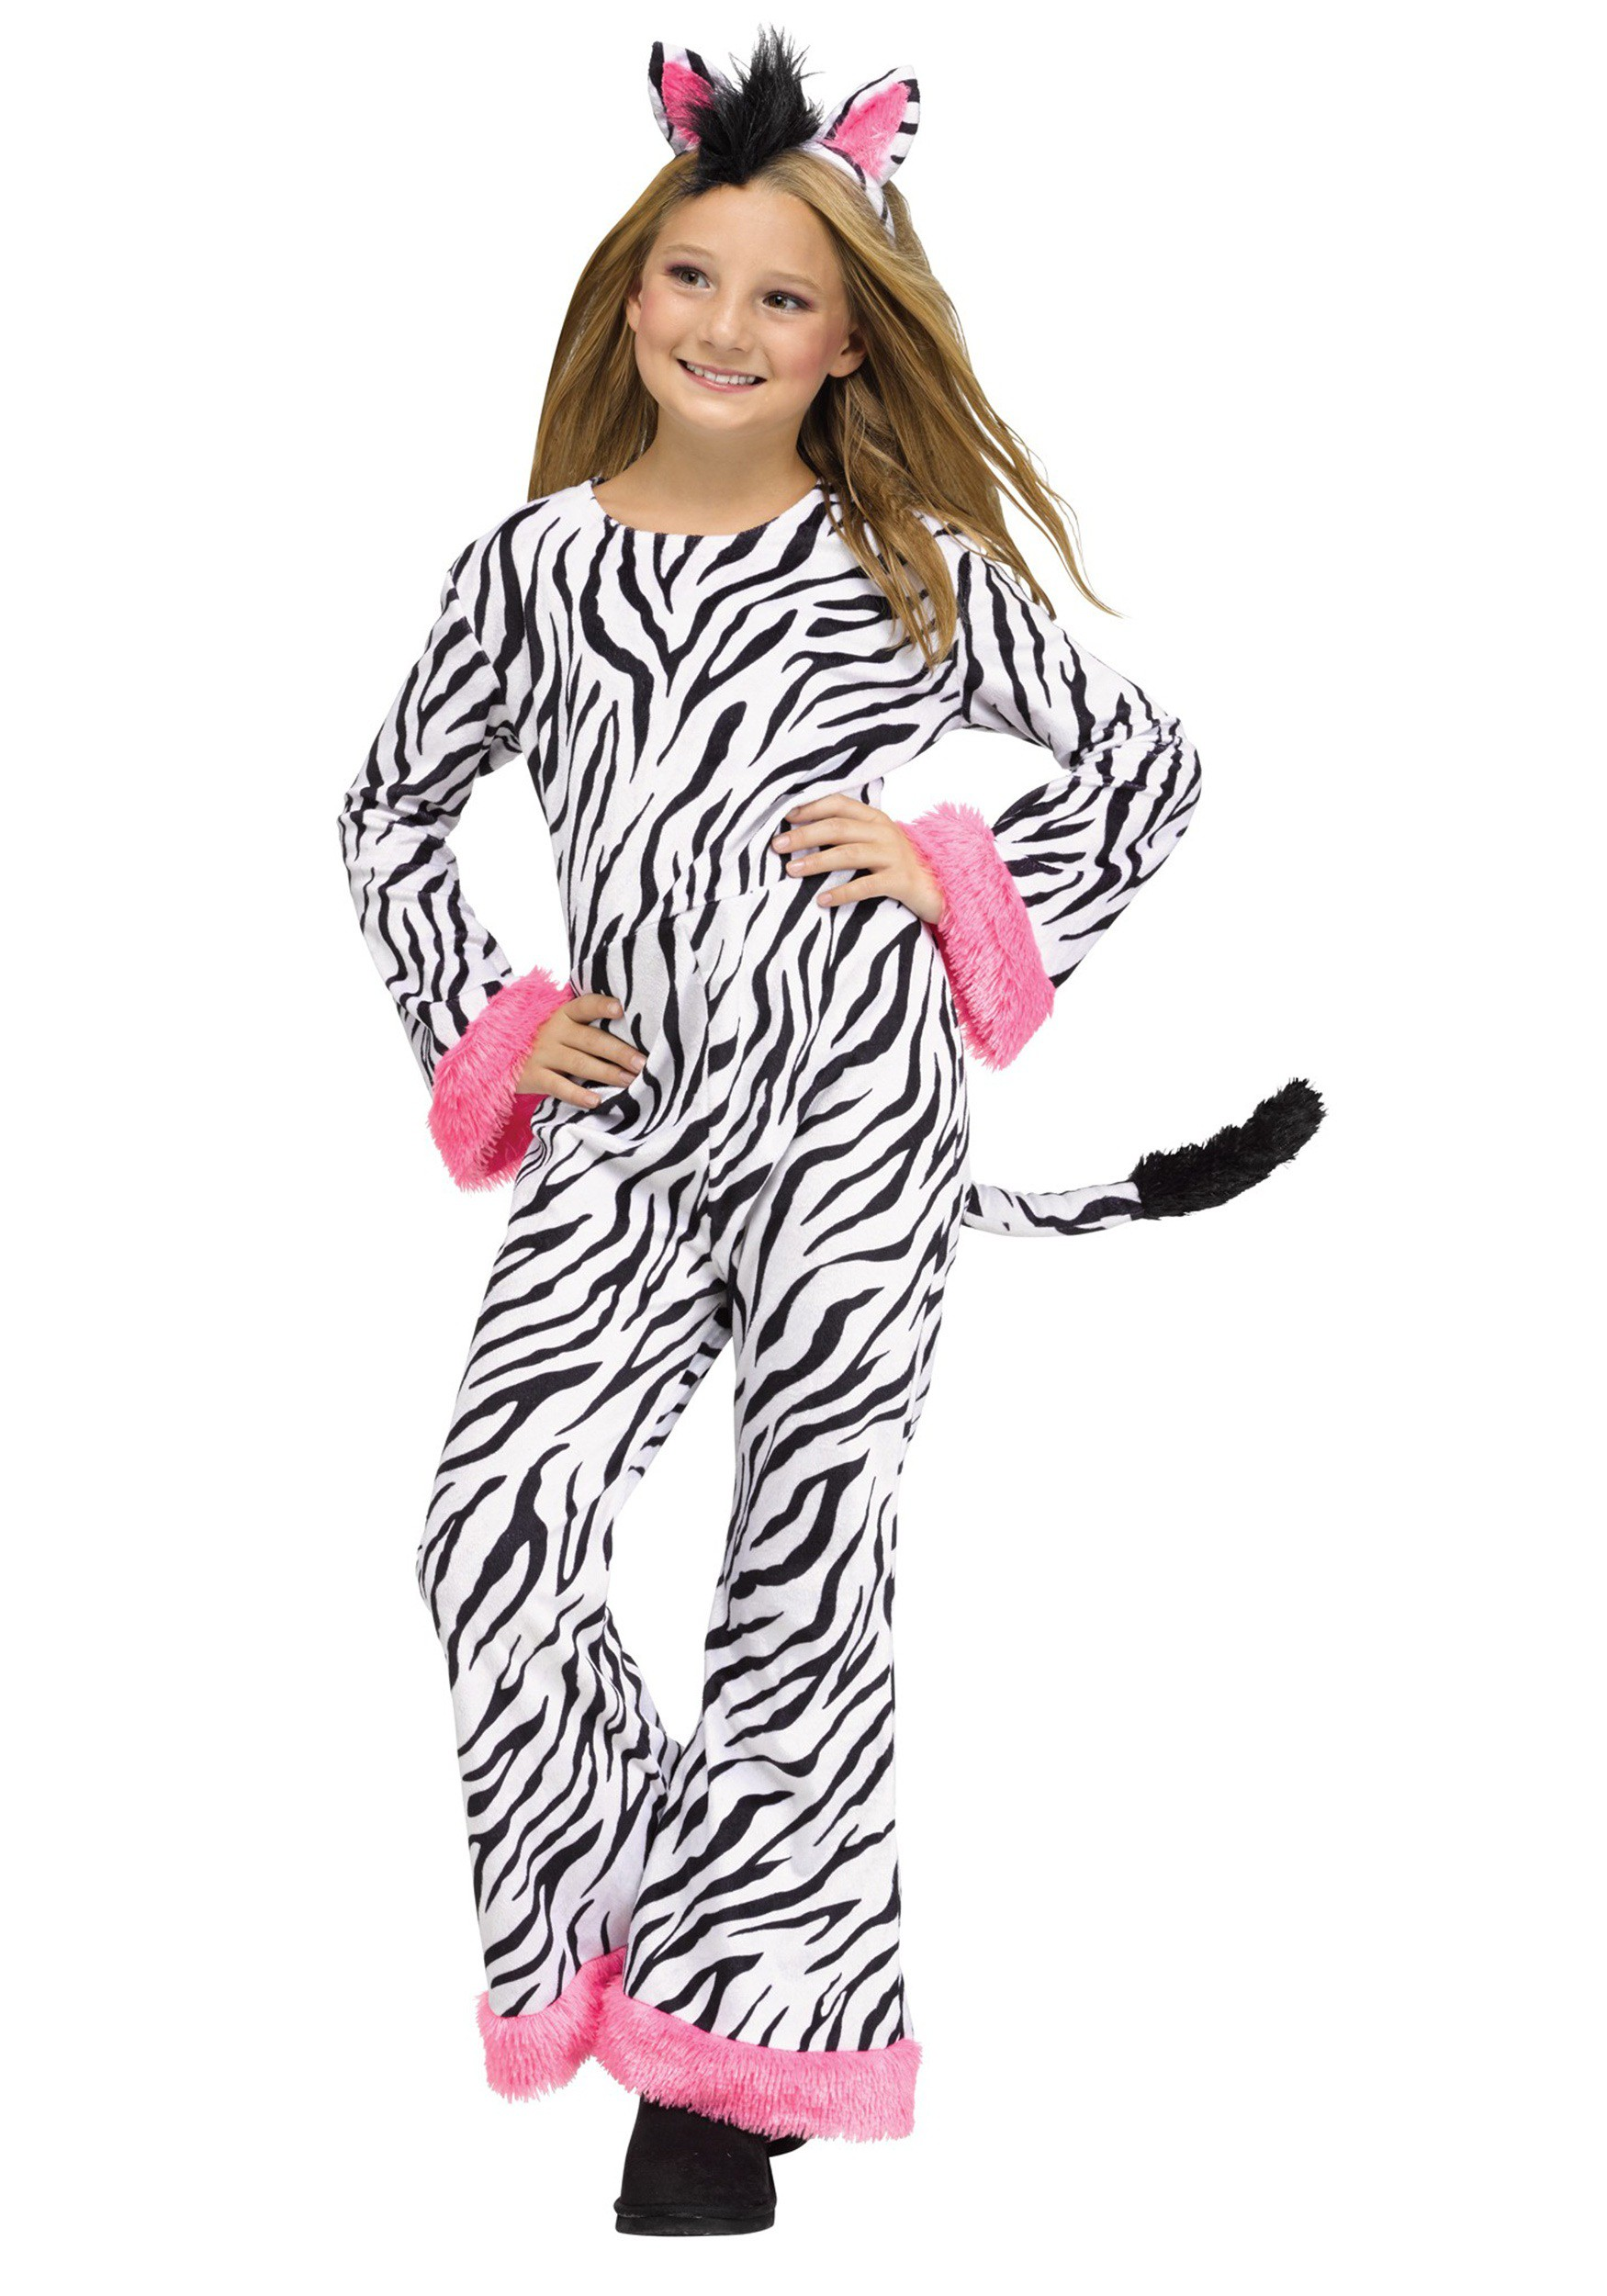 Zebra Costumes - HalloweenCostumes.com